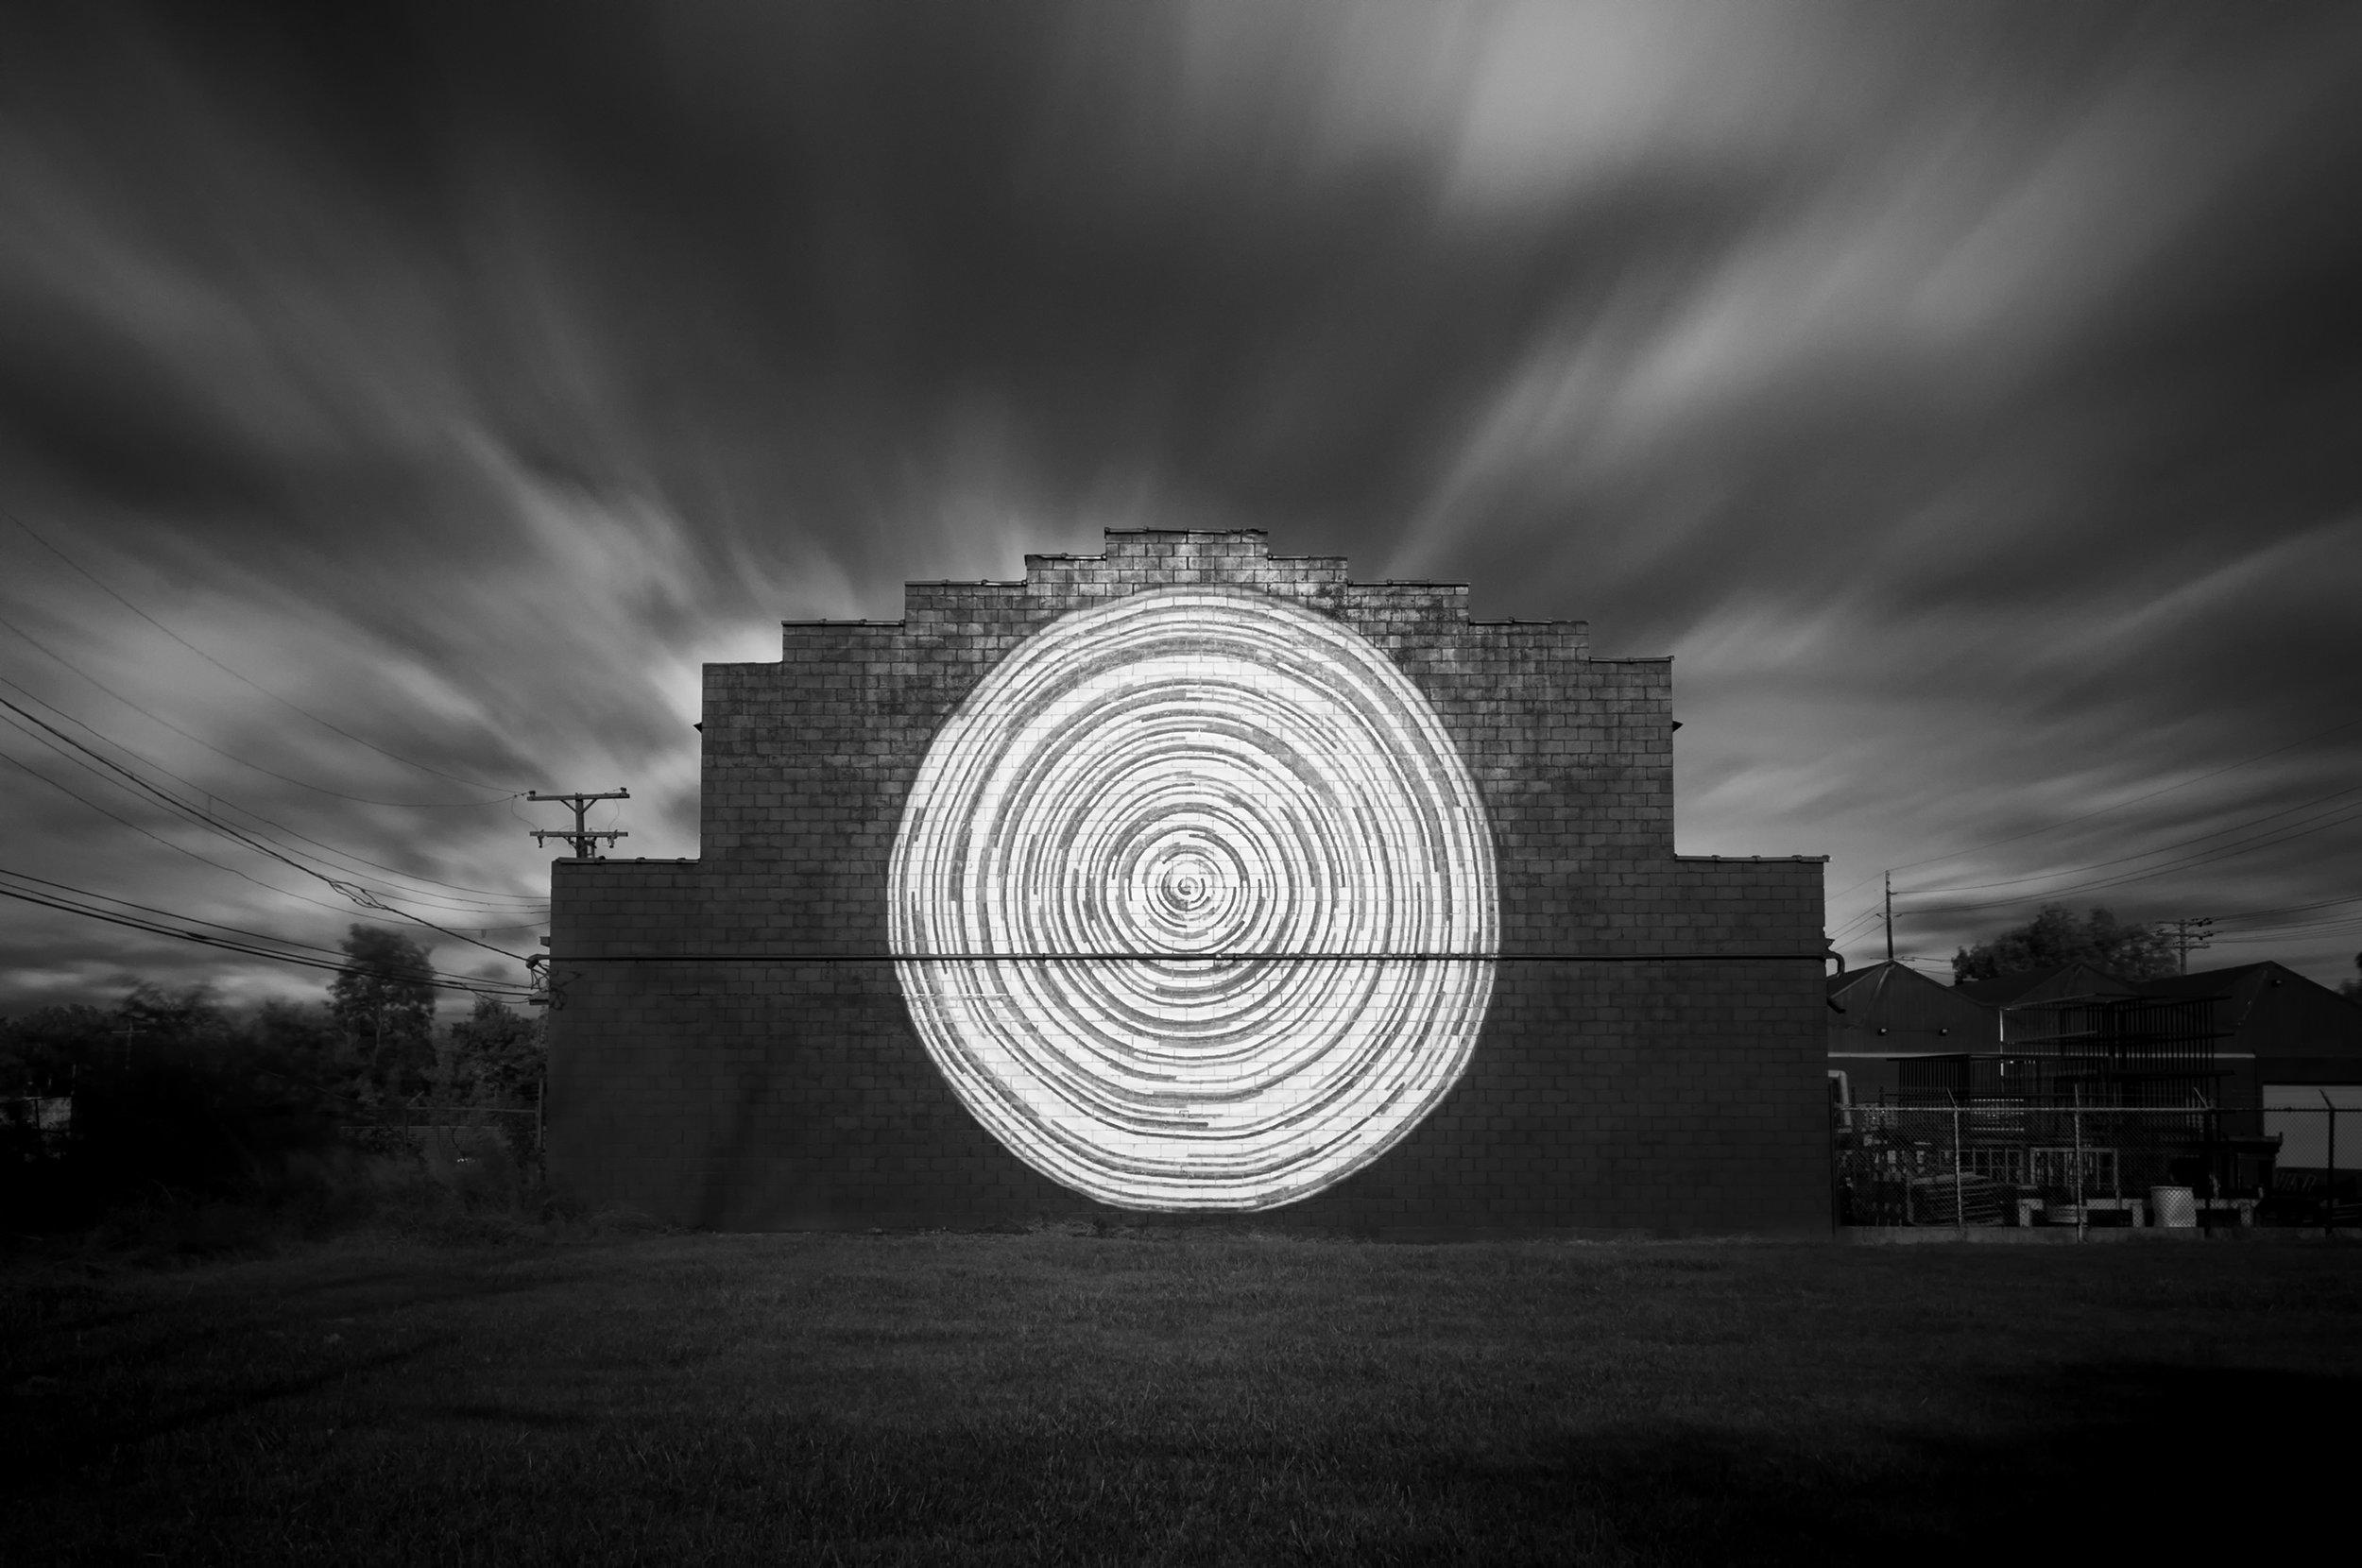 Delray Spiral, 2014